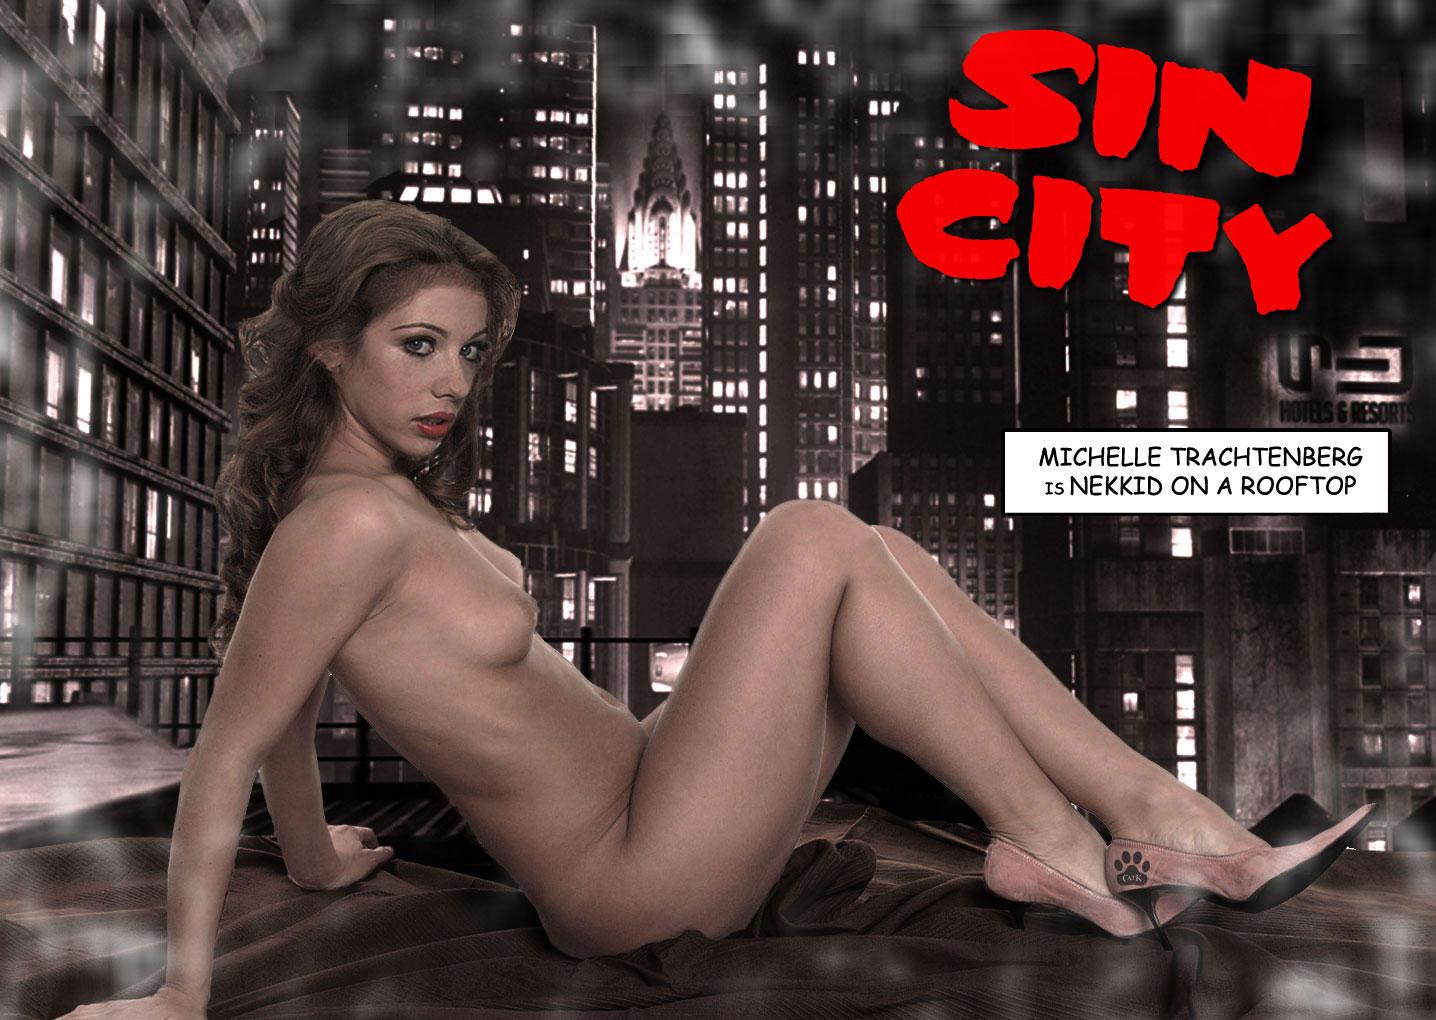 porn sites sin city